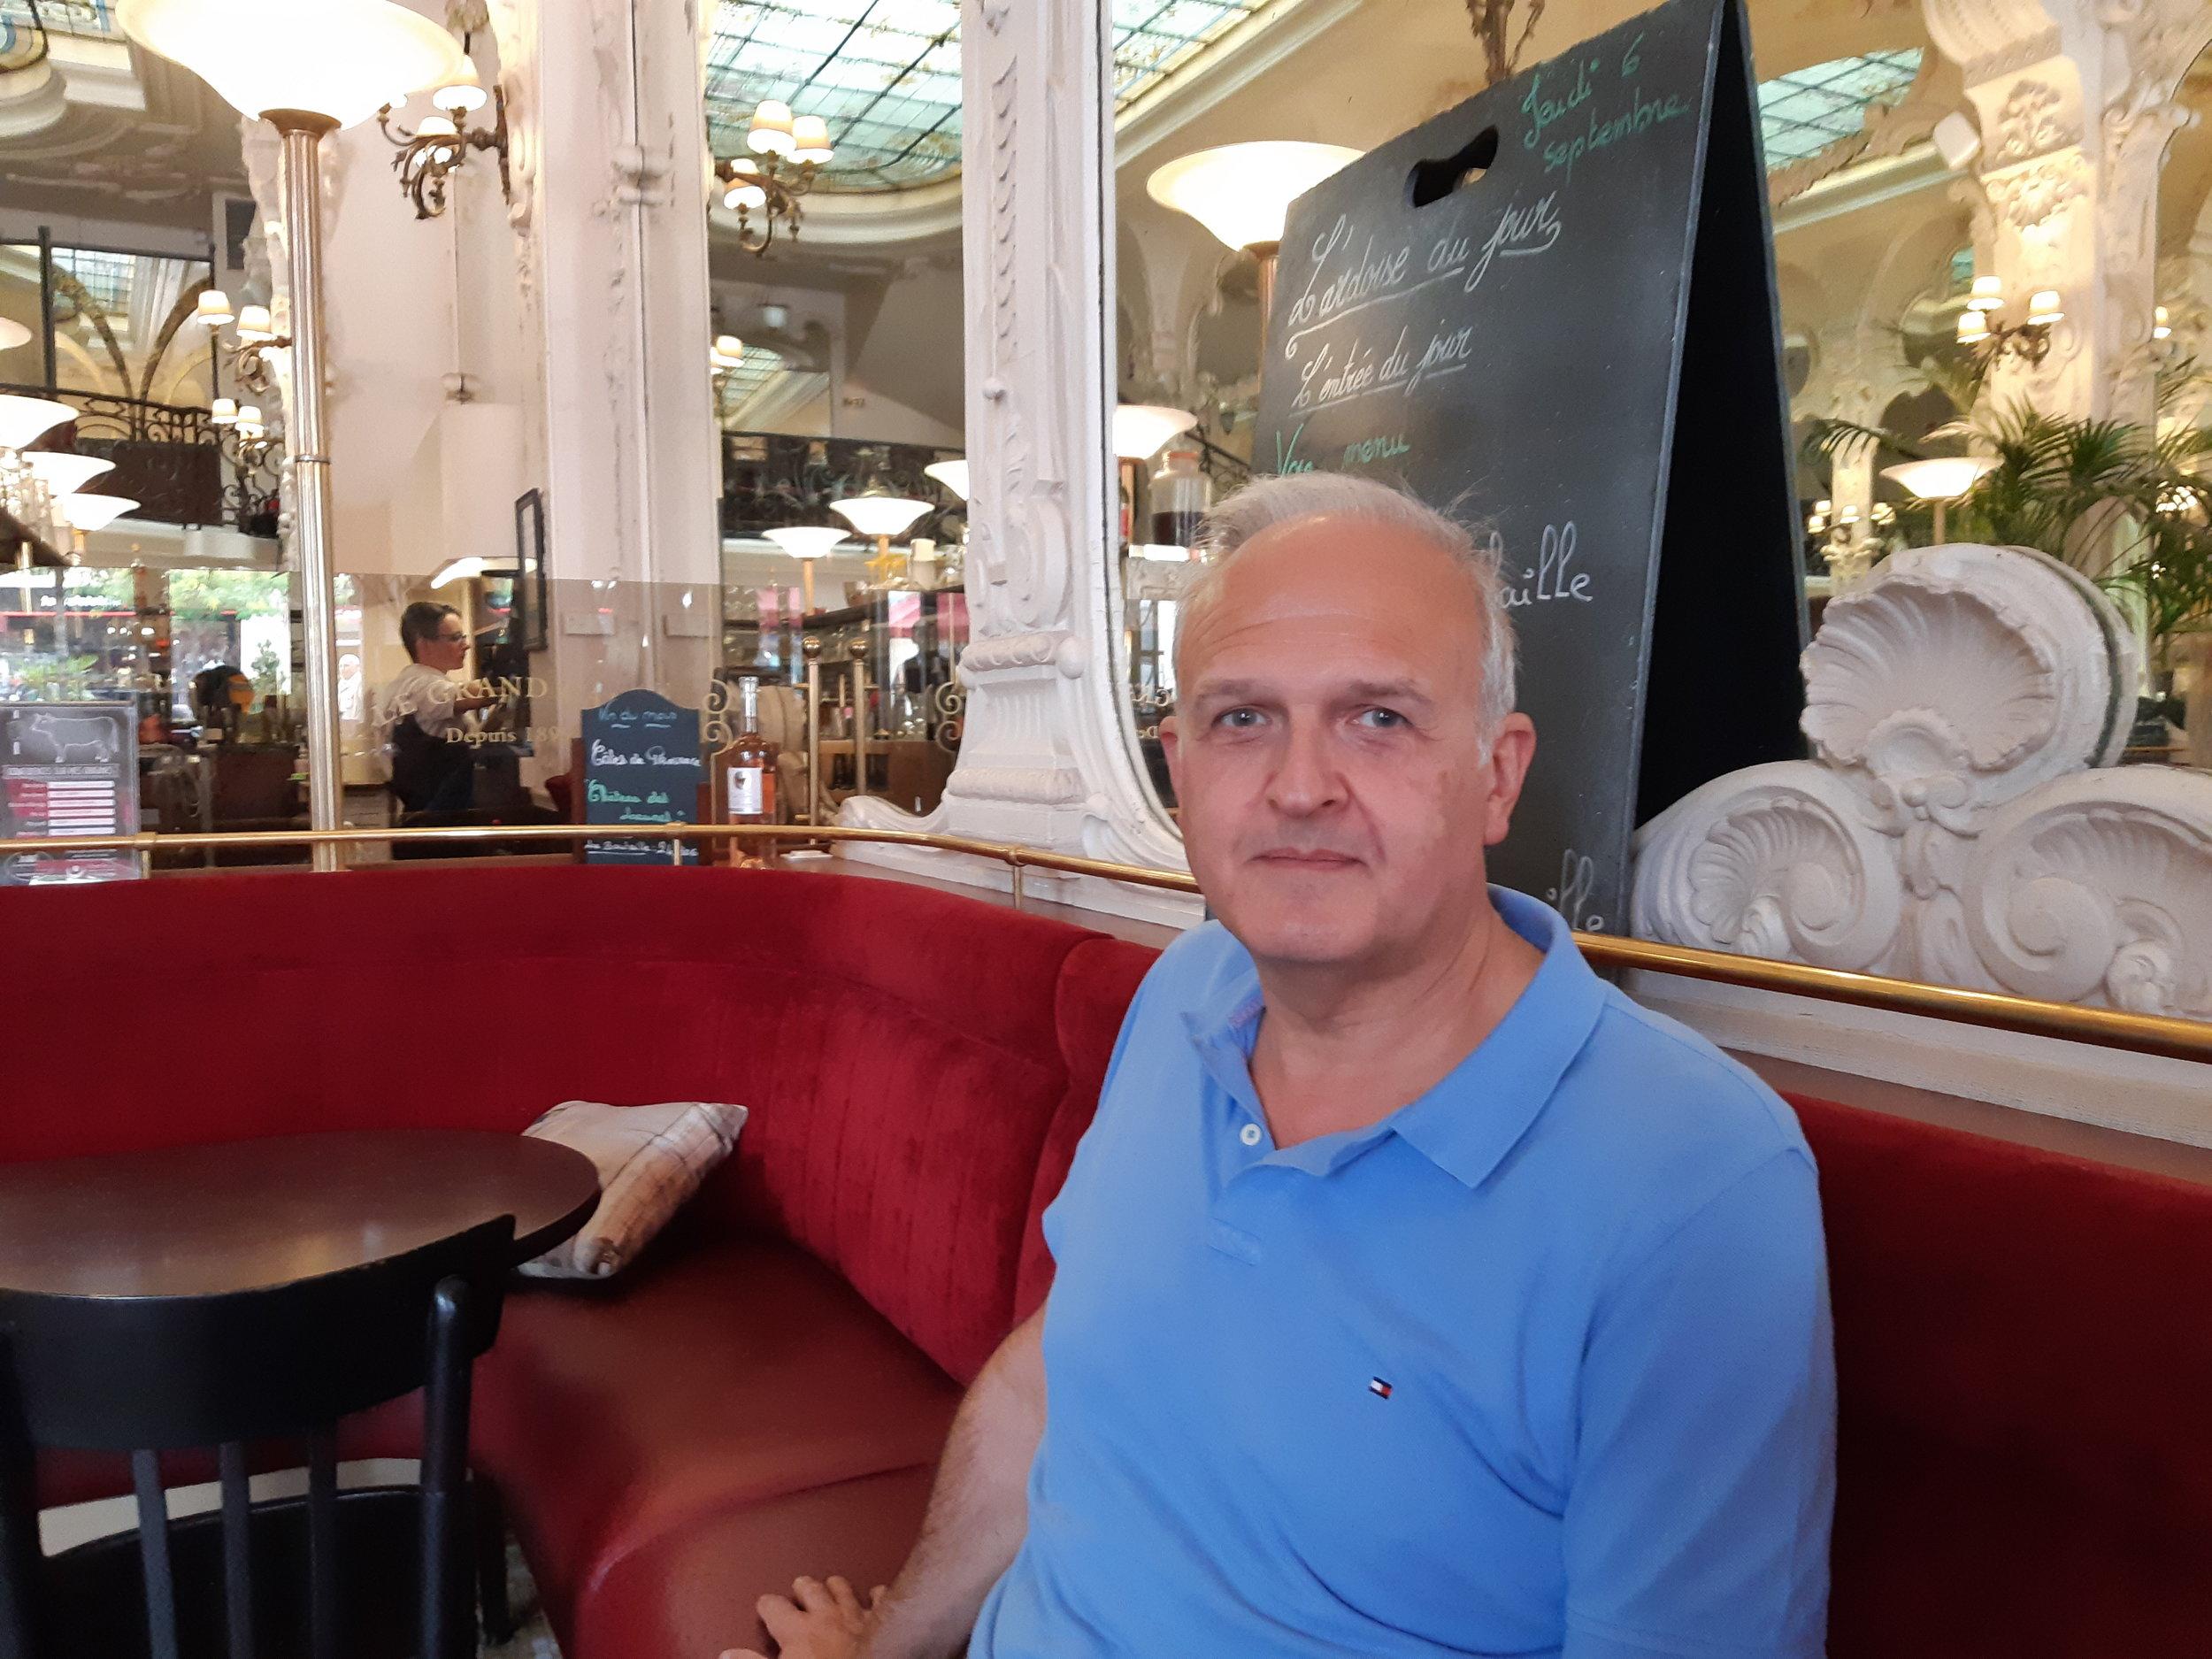 Moulins, Auvergne, The Grand Cafe, September 2018.